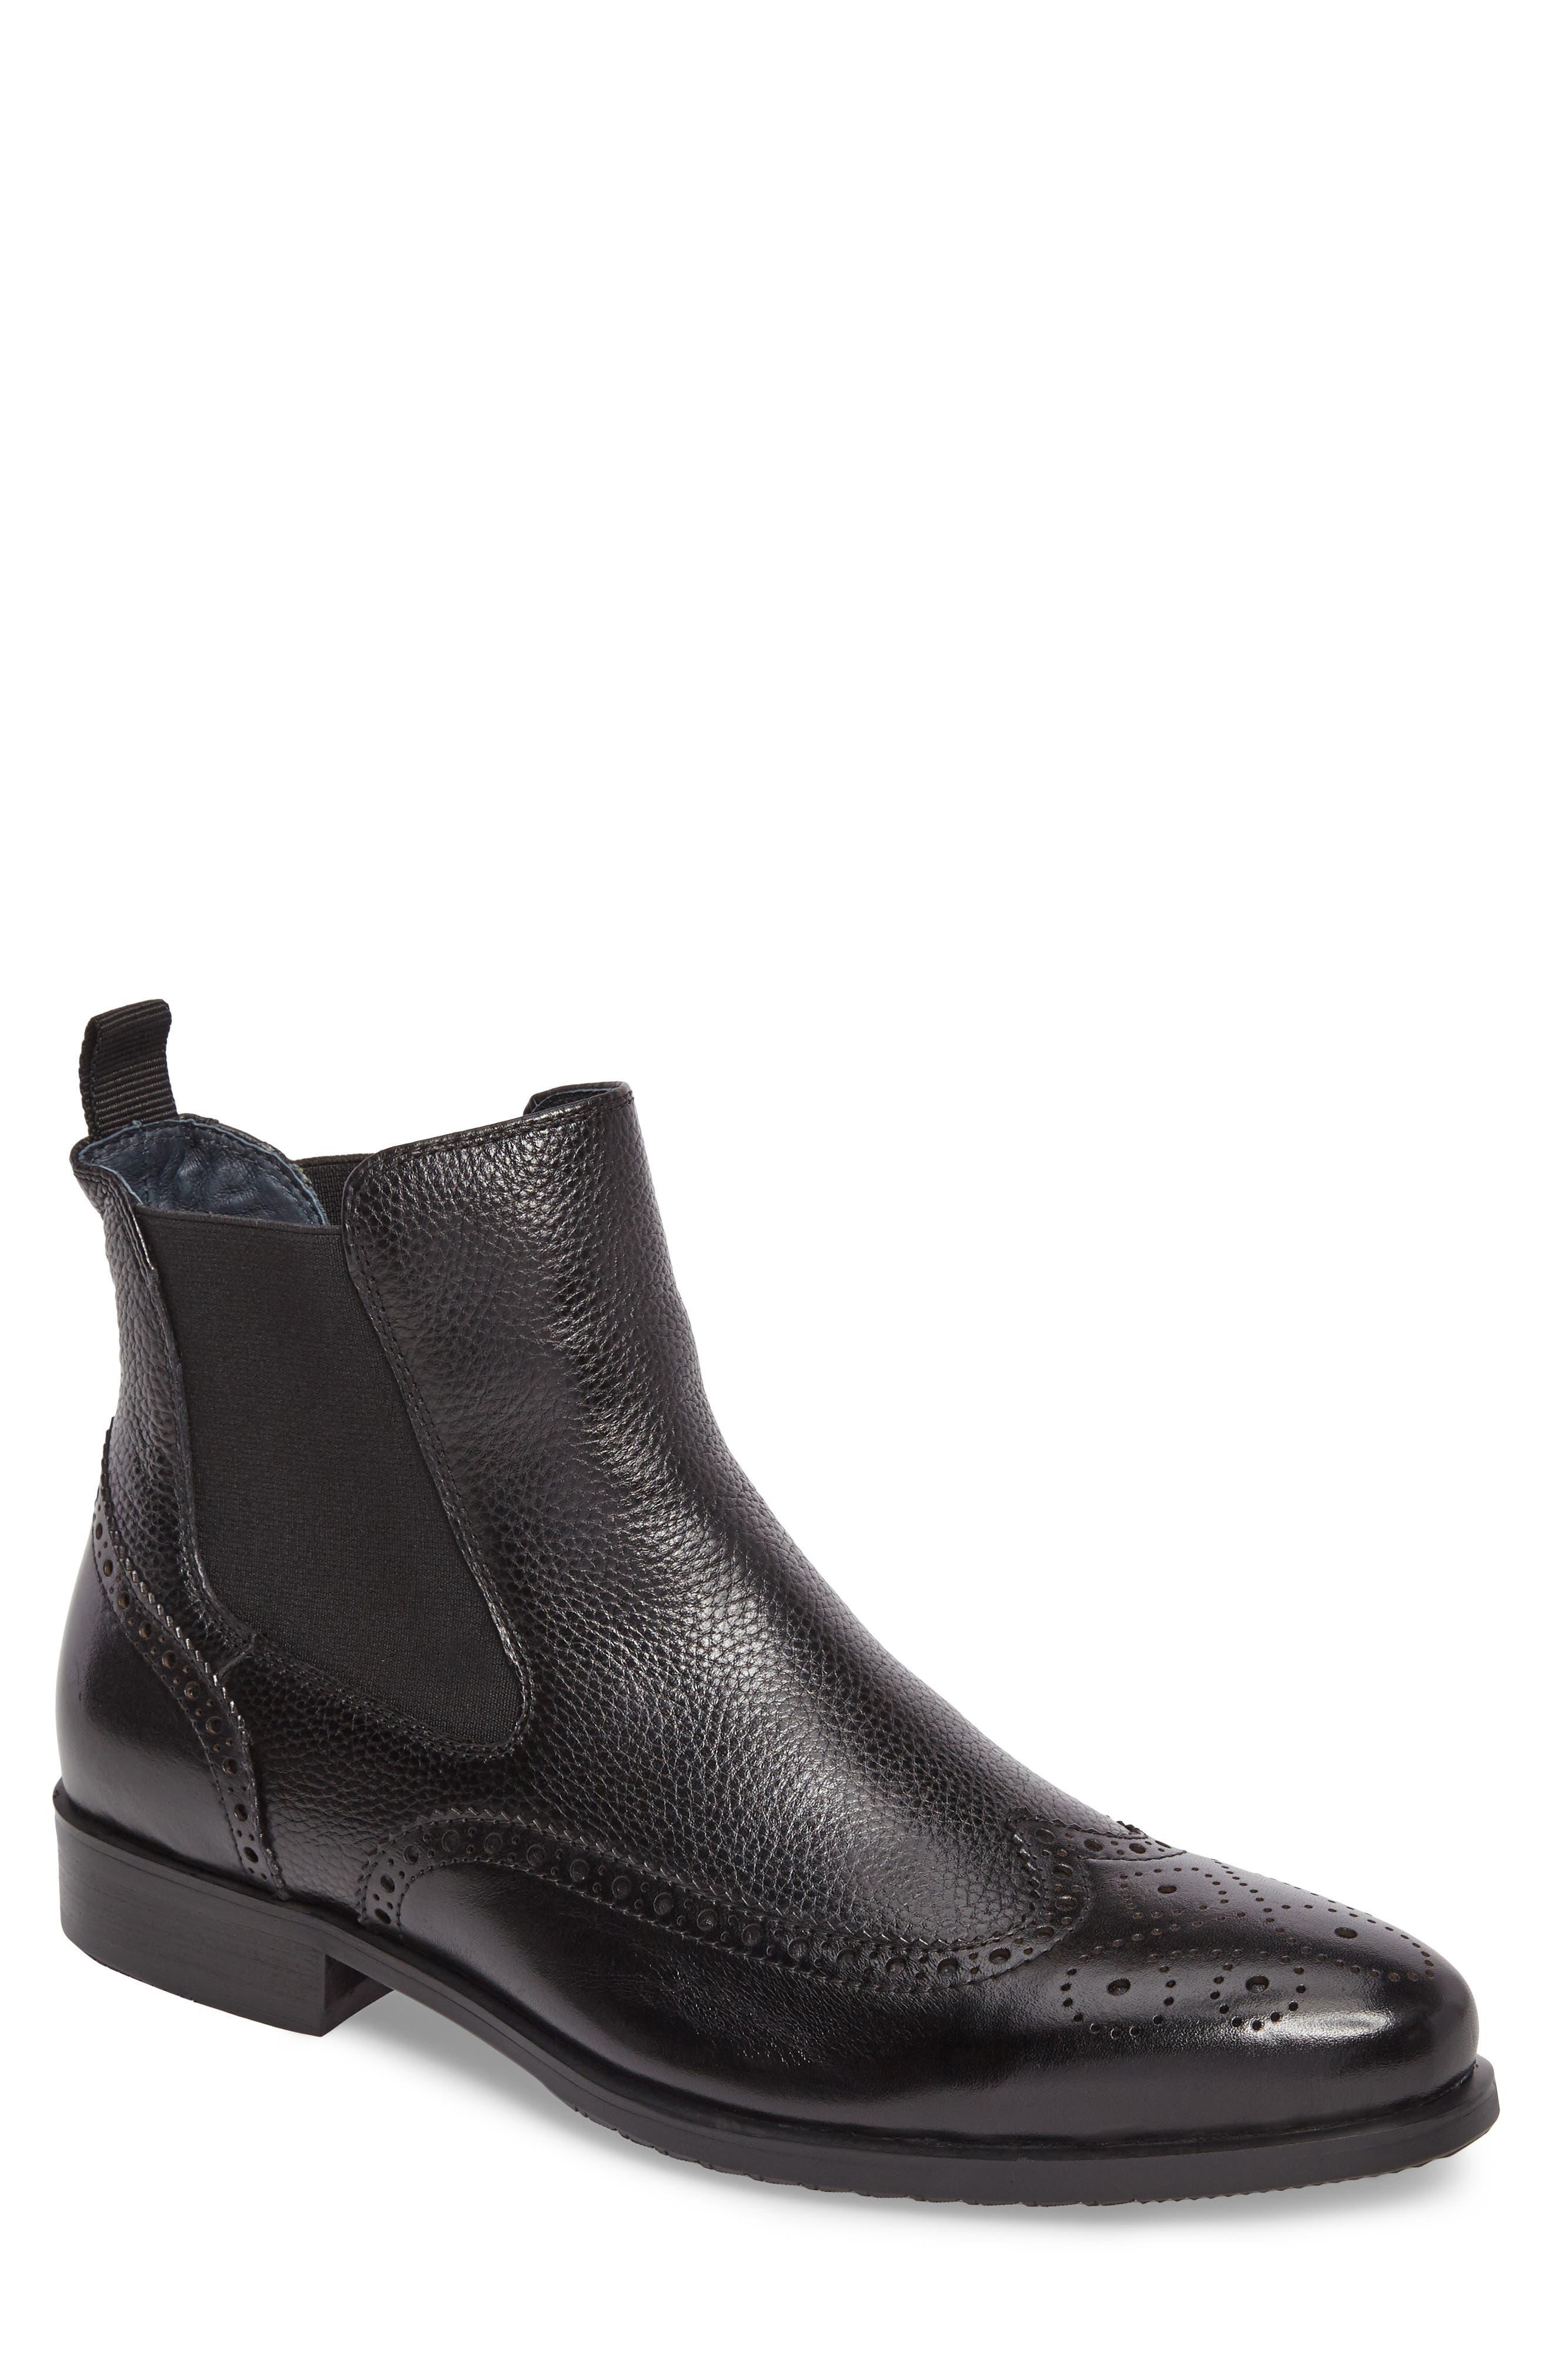 Hamel Chelsea Boot,                         Main,                         color, 001